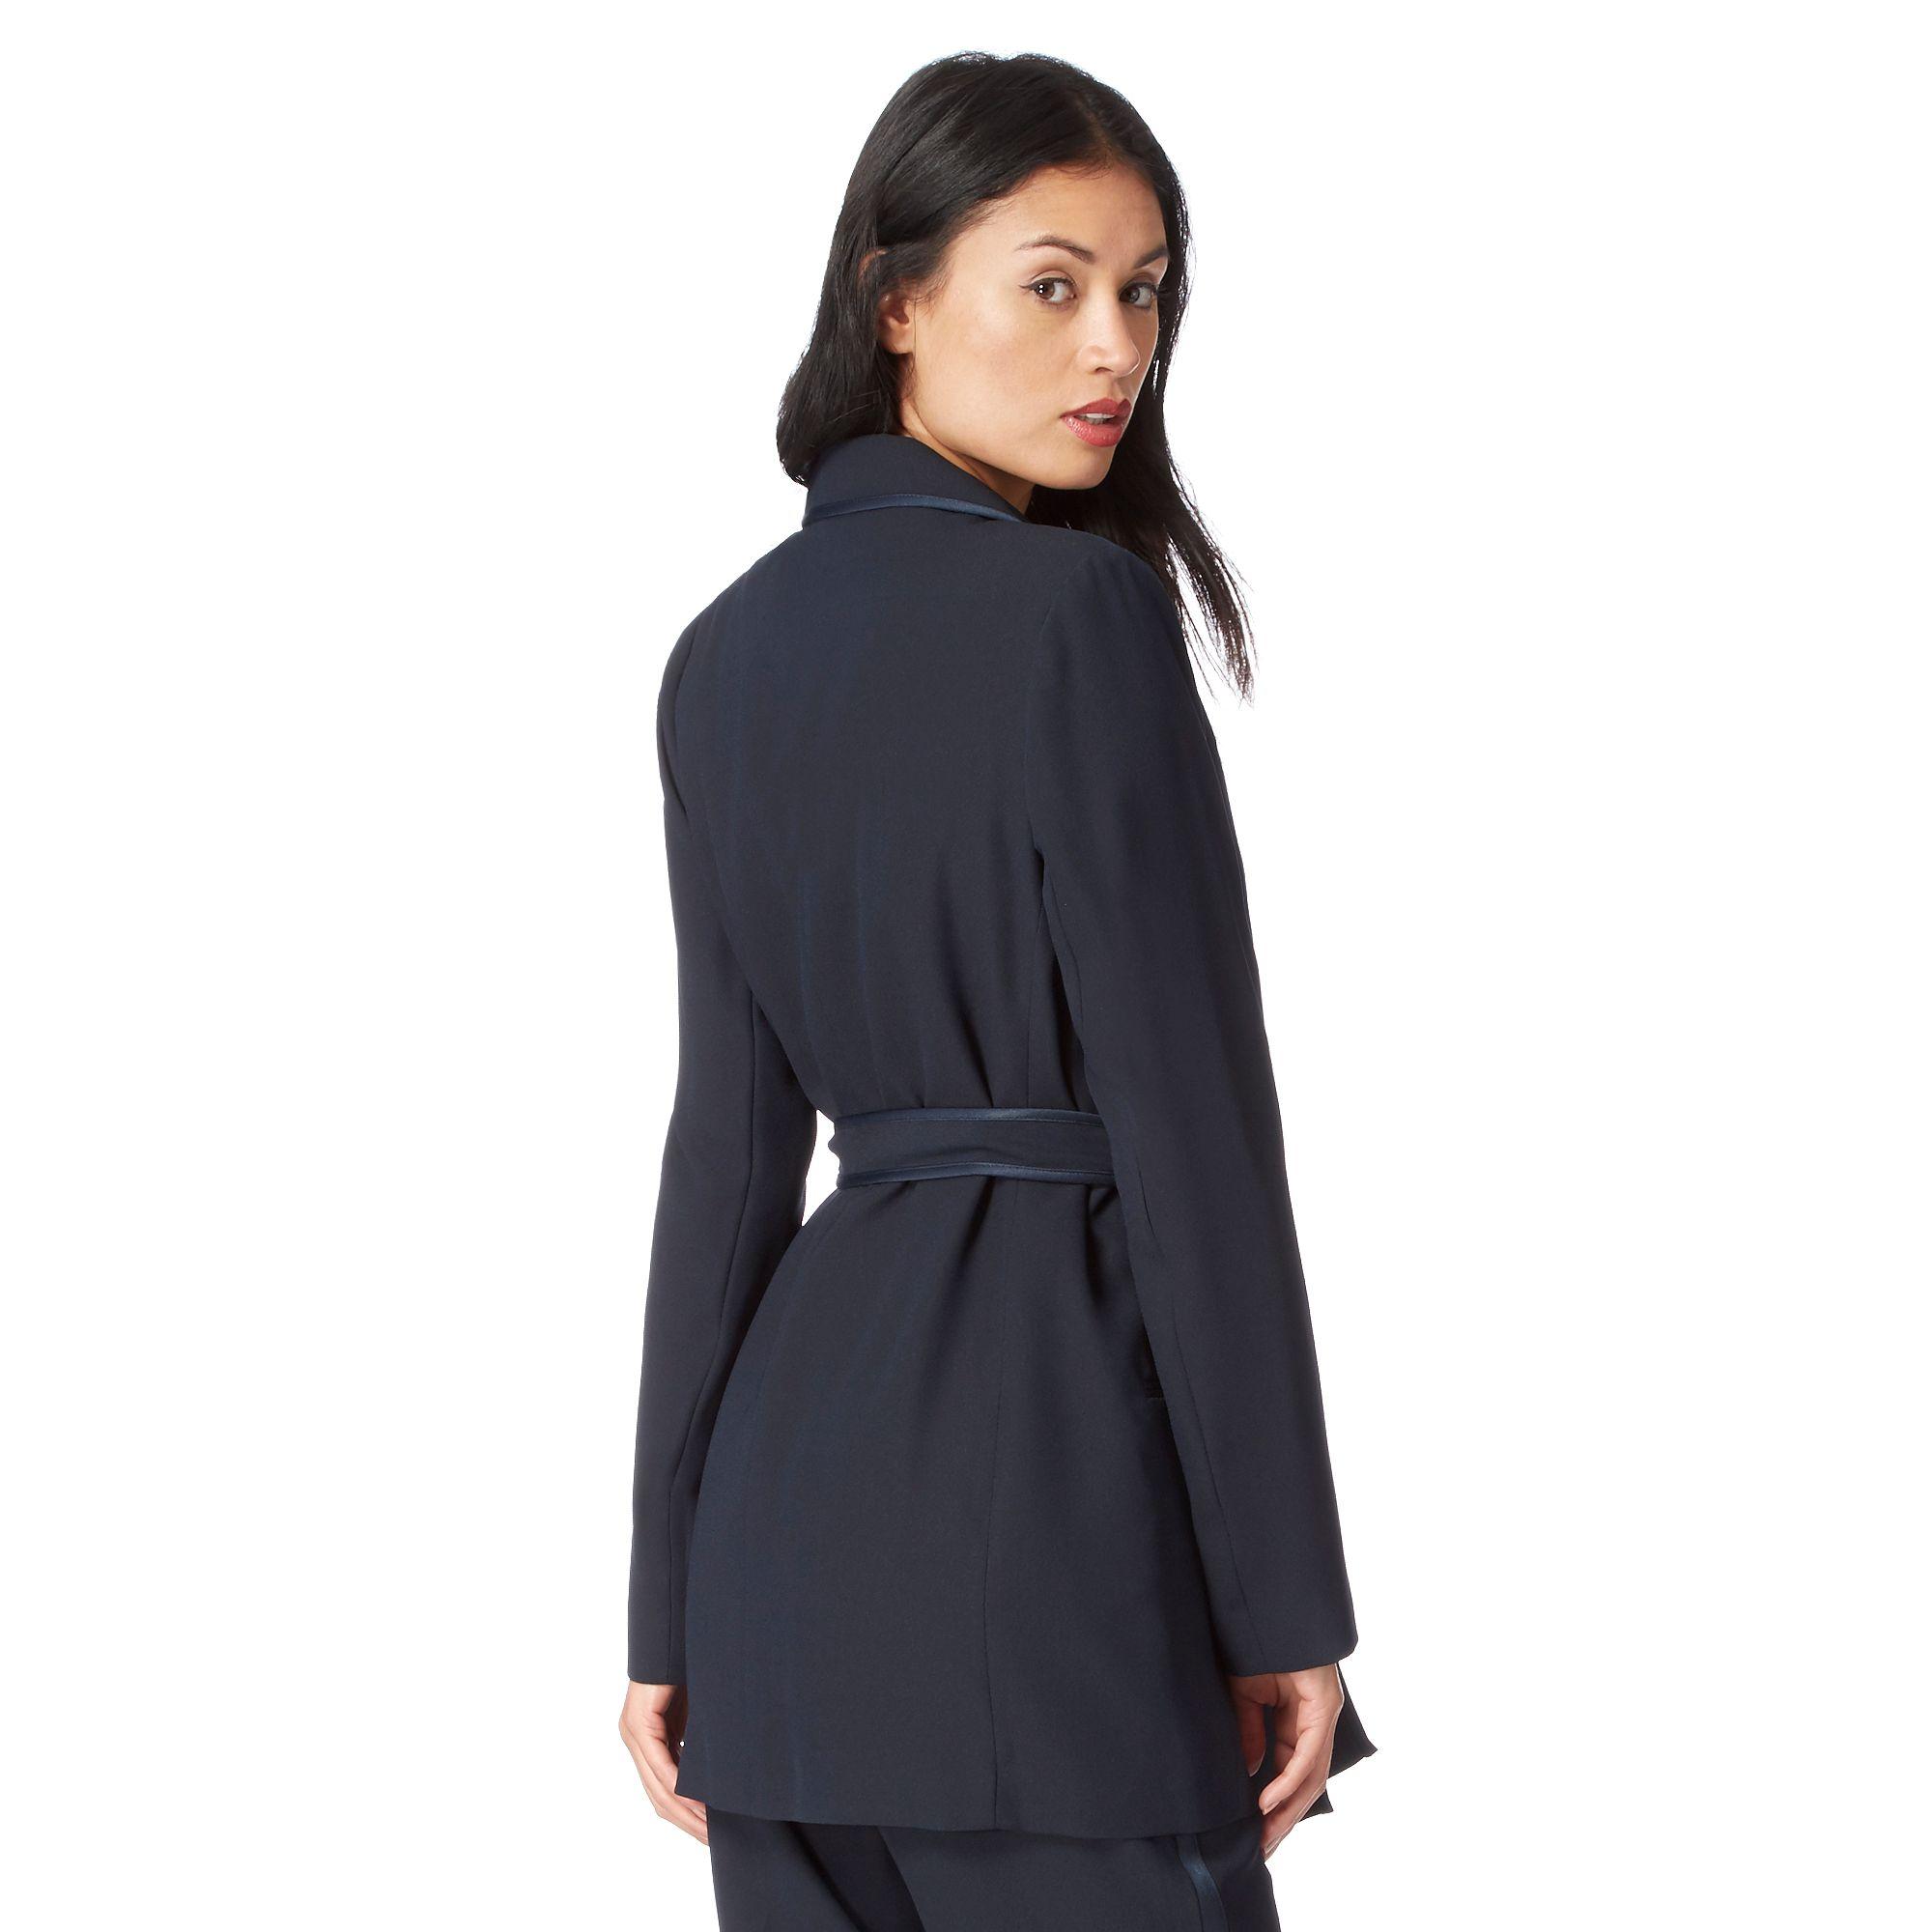 J By Jasper Conran Womens Navy Belted Tuxedo Jacket From Debenhams | EBay